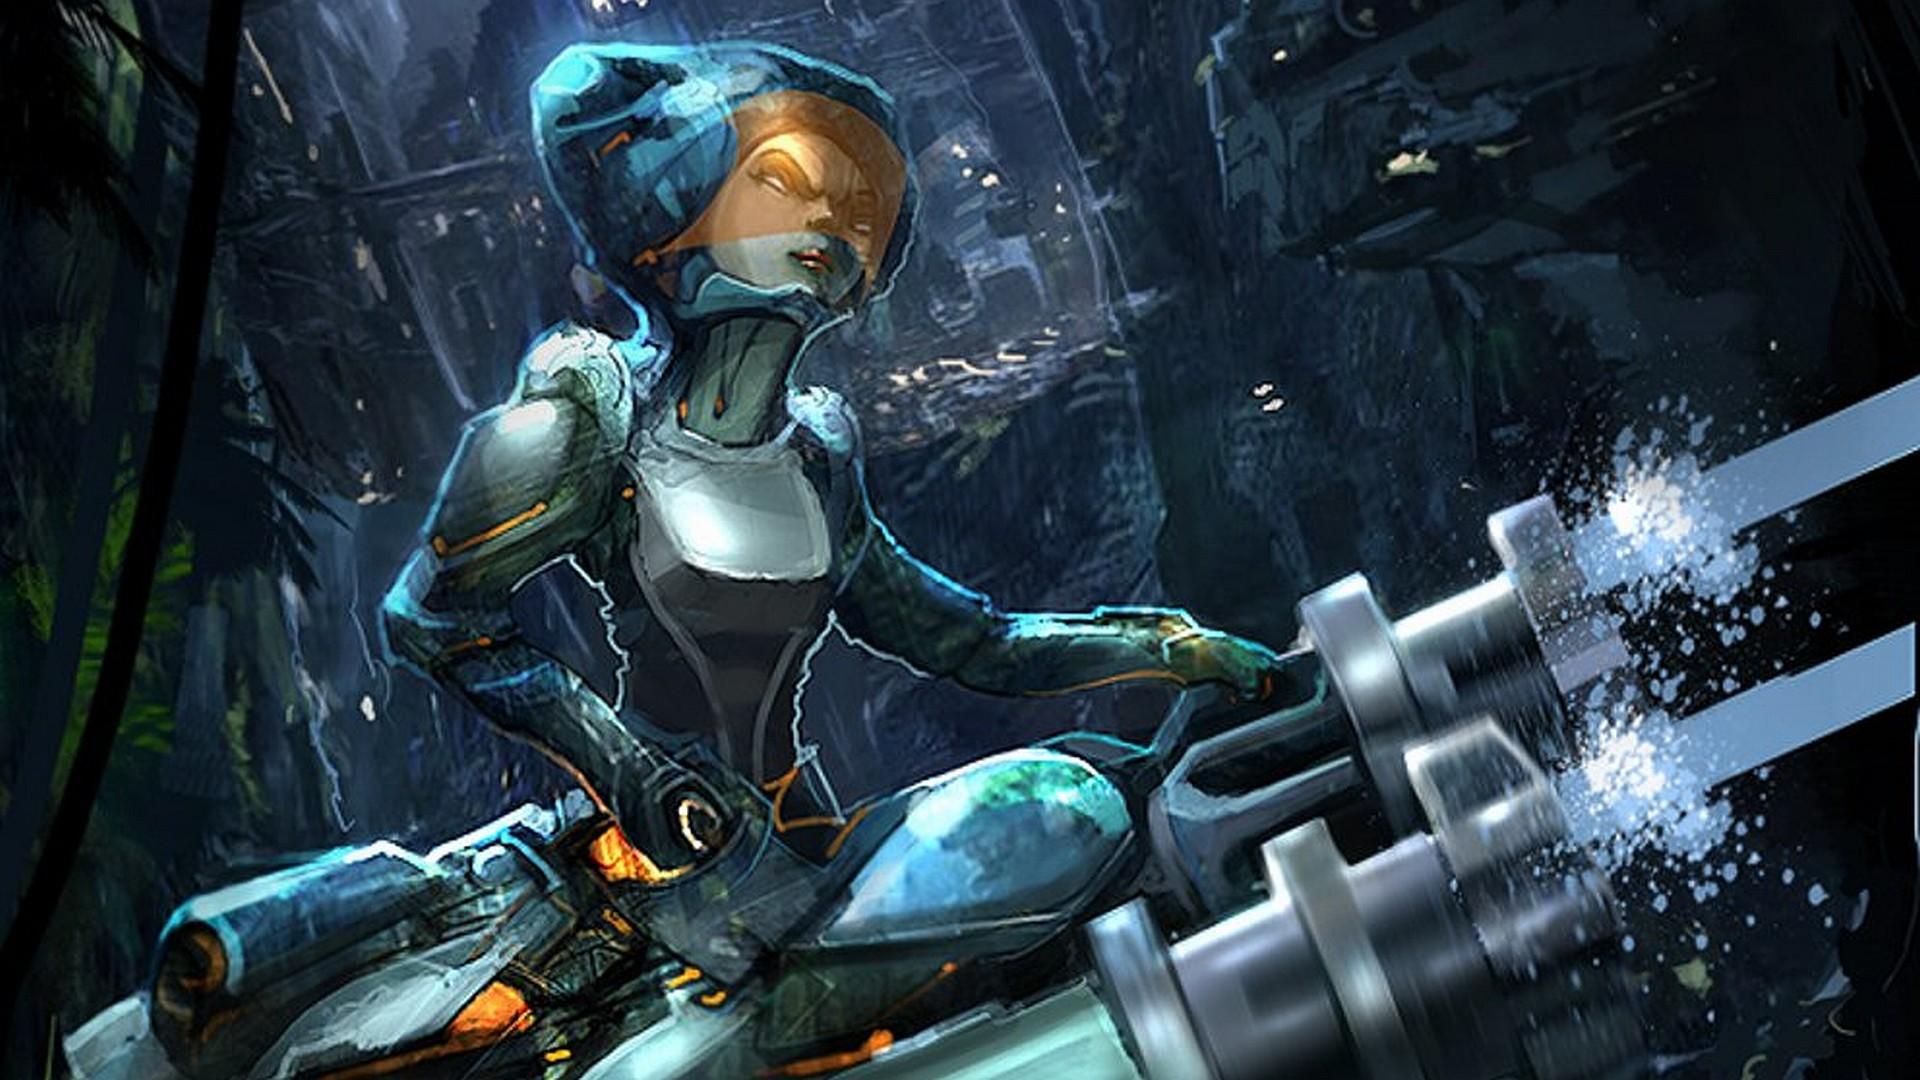 Sci Fi Fantasy Wallpaper (74+ images)